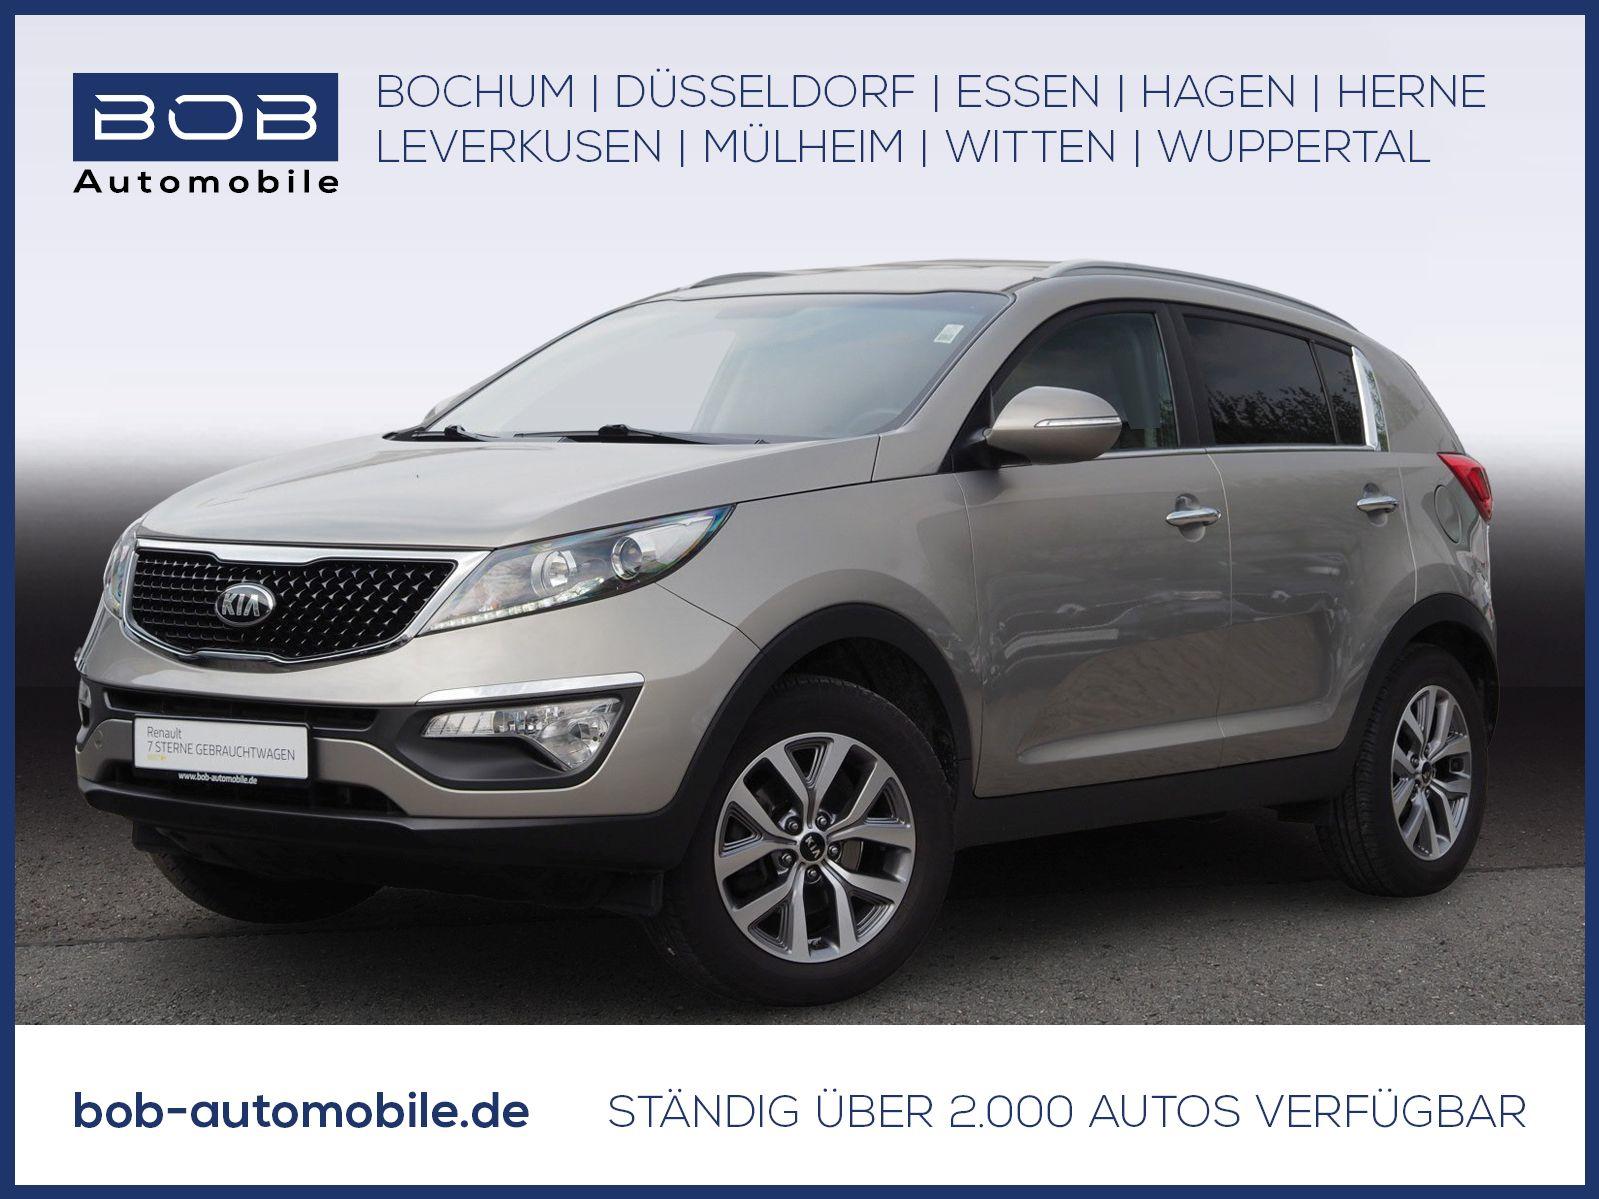 Kia Sportage Vision 1.6 GDI 2WD NAVI PDC KLIMA BT ZV, Jahr 2015, Benzin